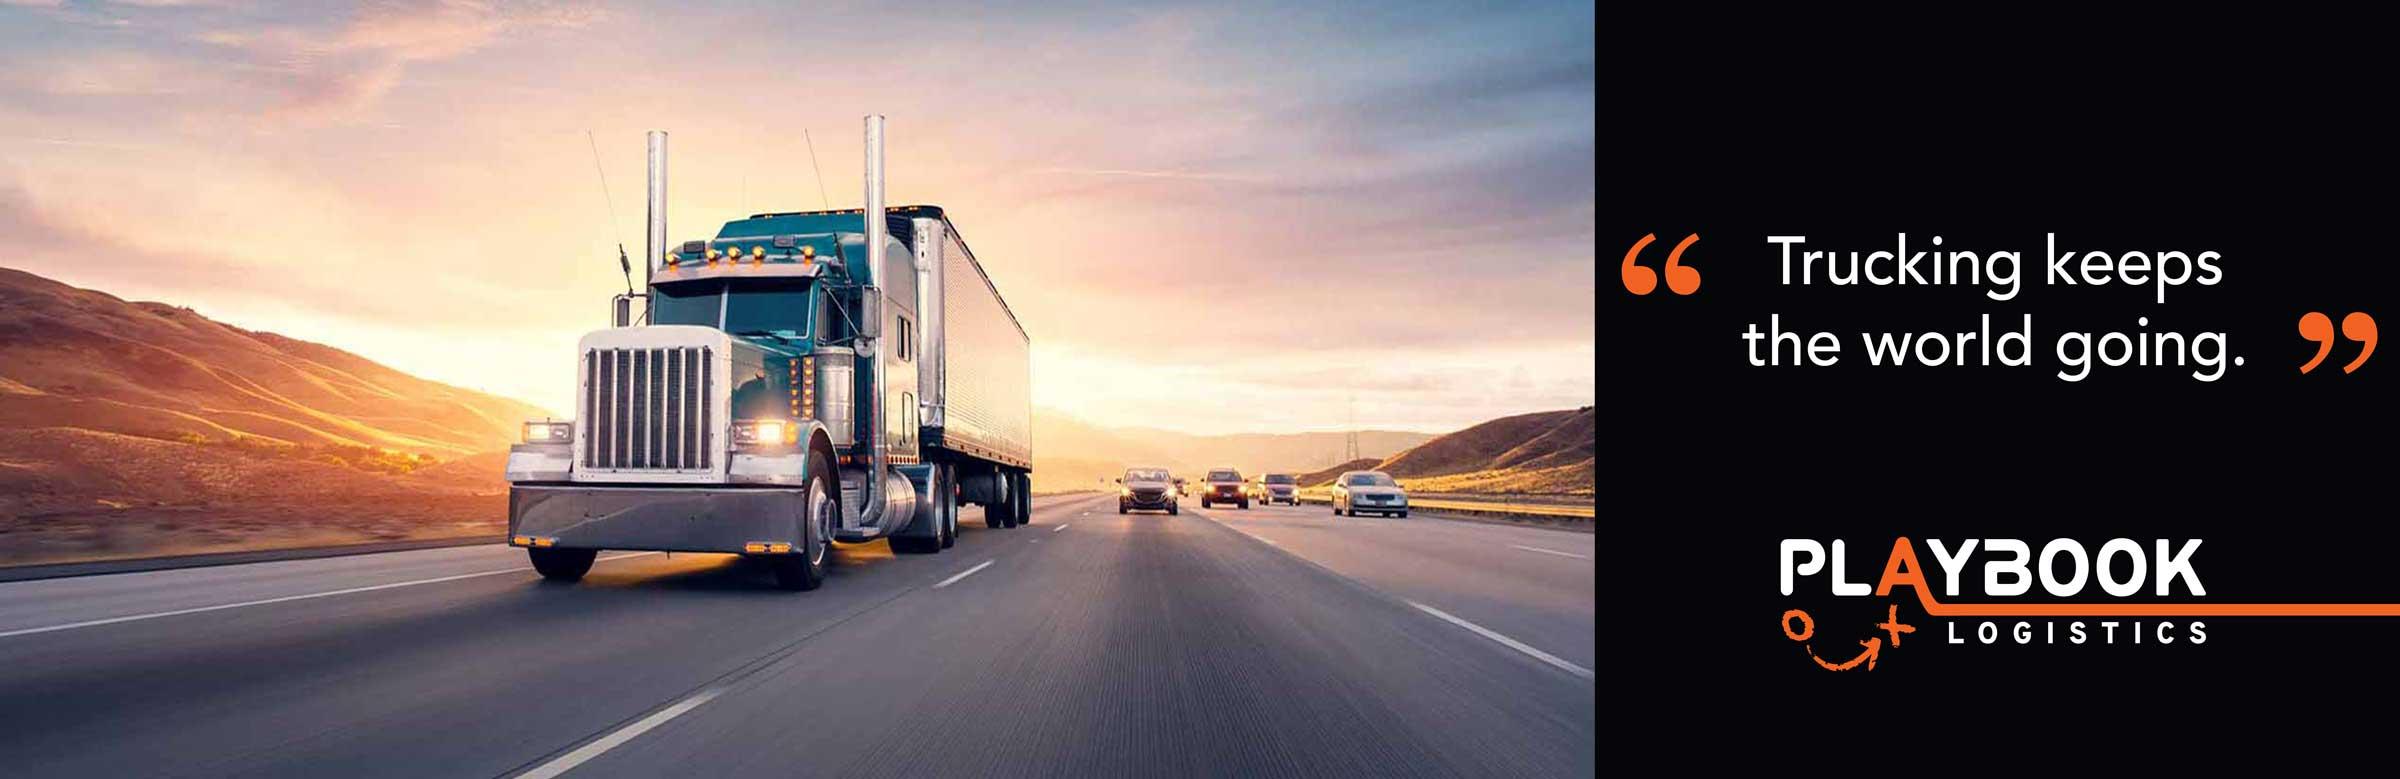 Trucking-Freight-Playbook-Logistics